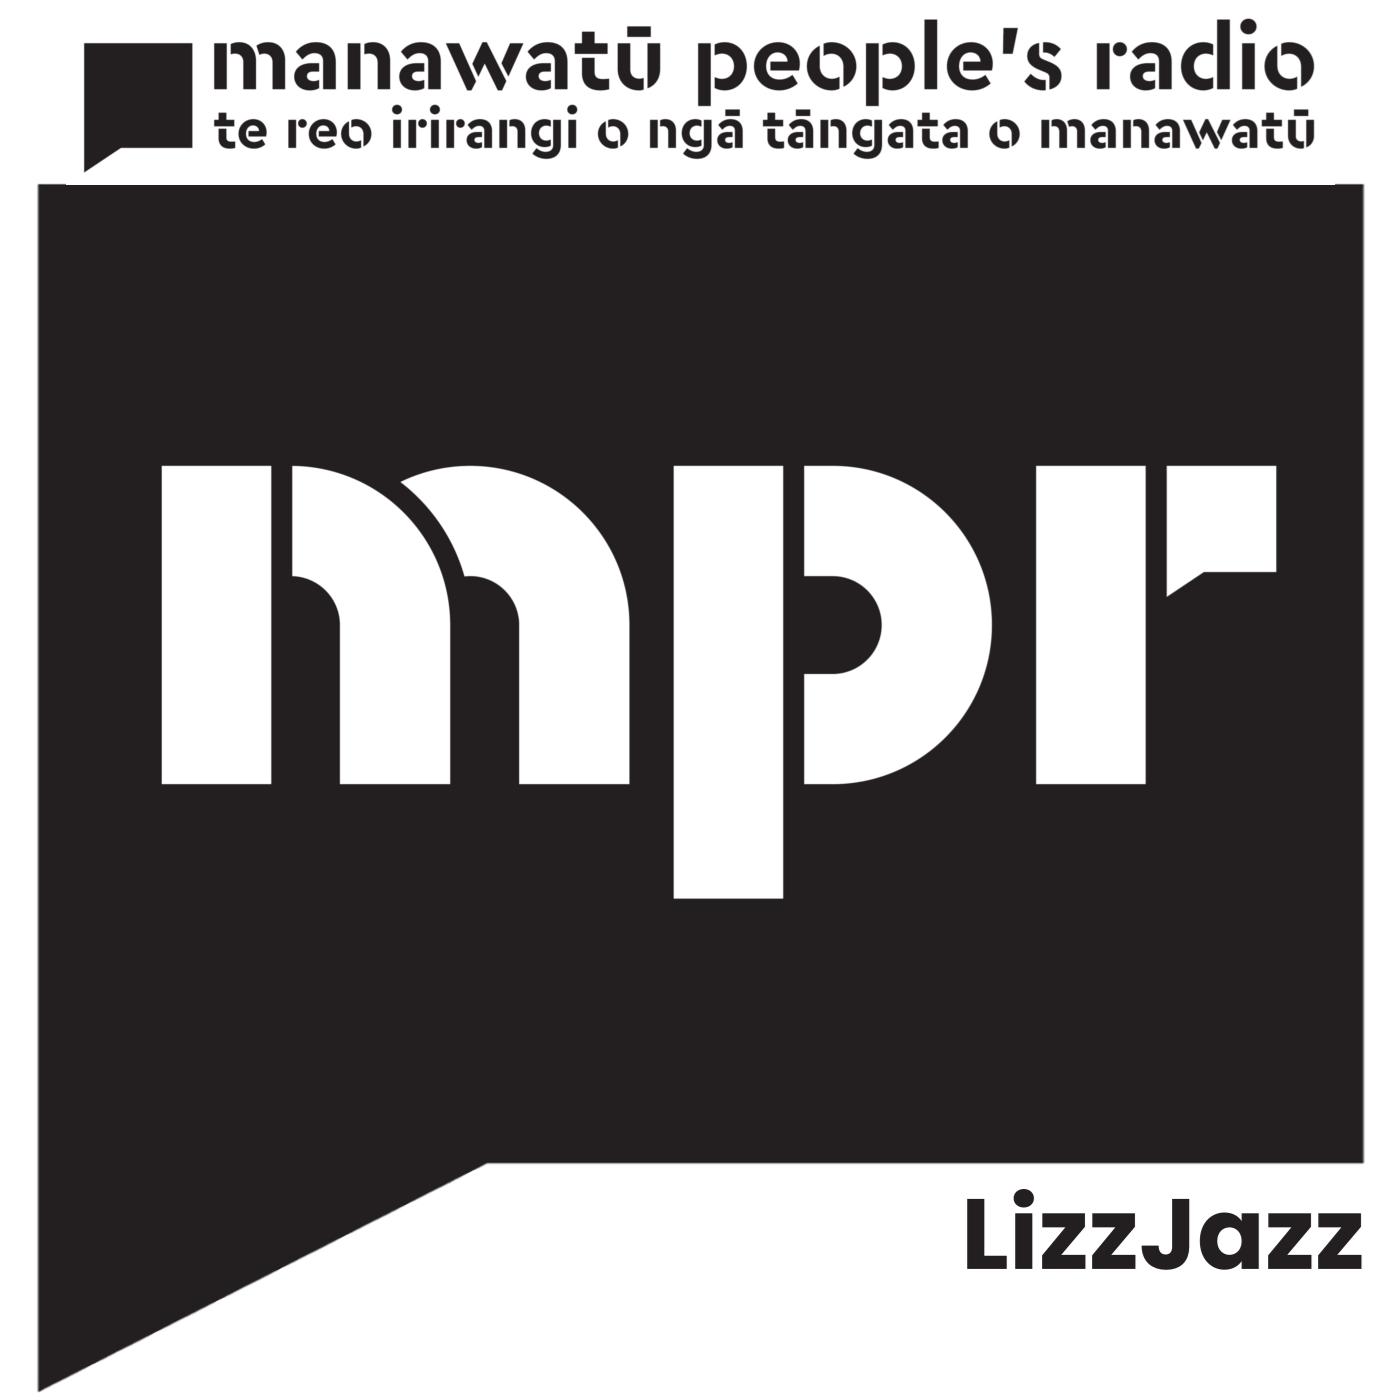 https://cdn.accessradio.org/StationFolder/manawatu/Images/MPRLizJazz.png